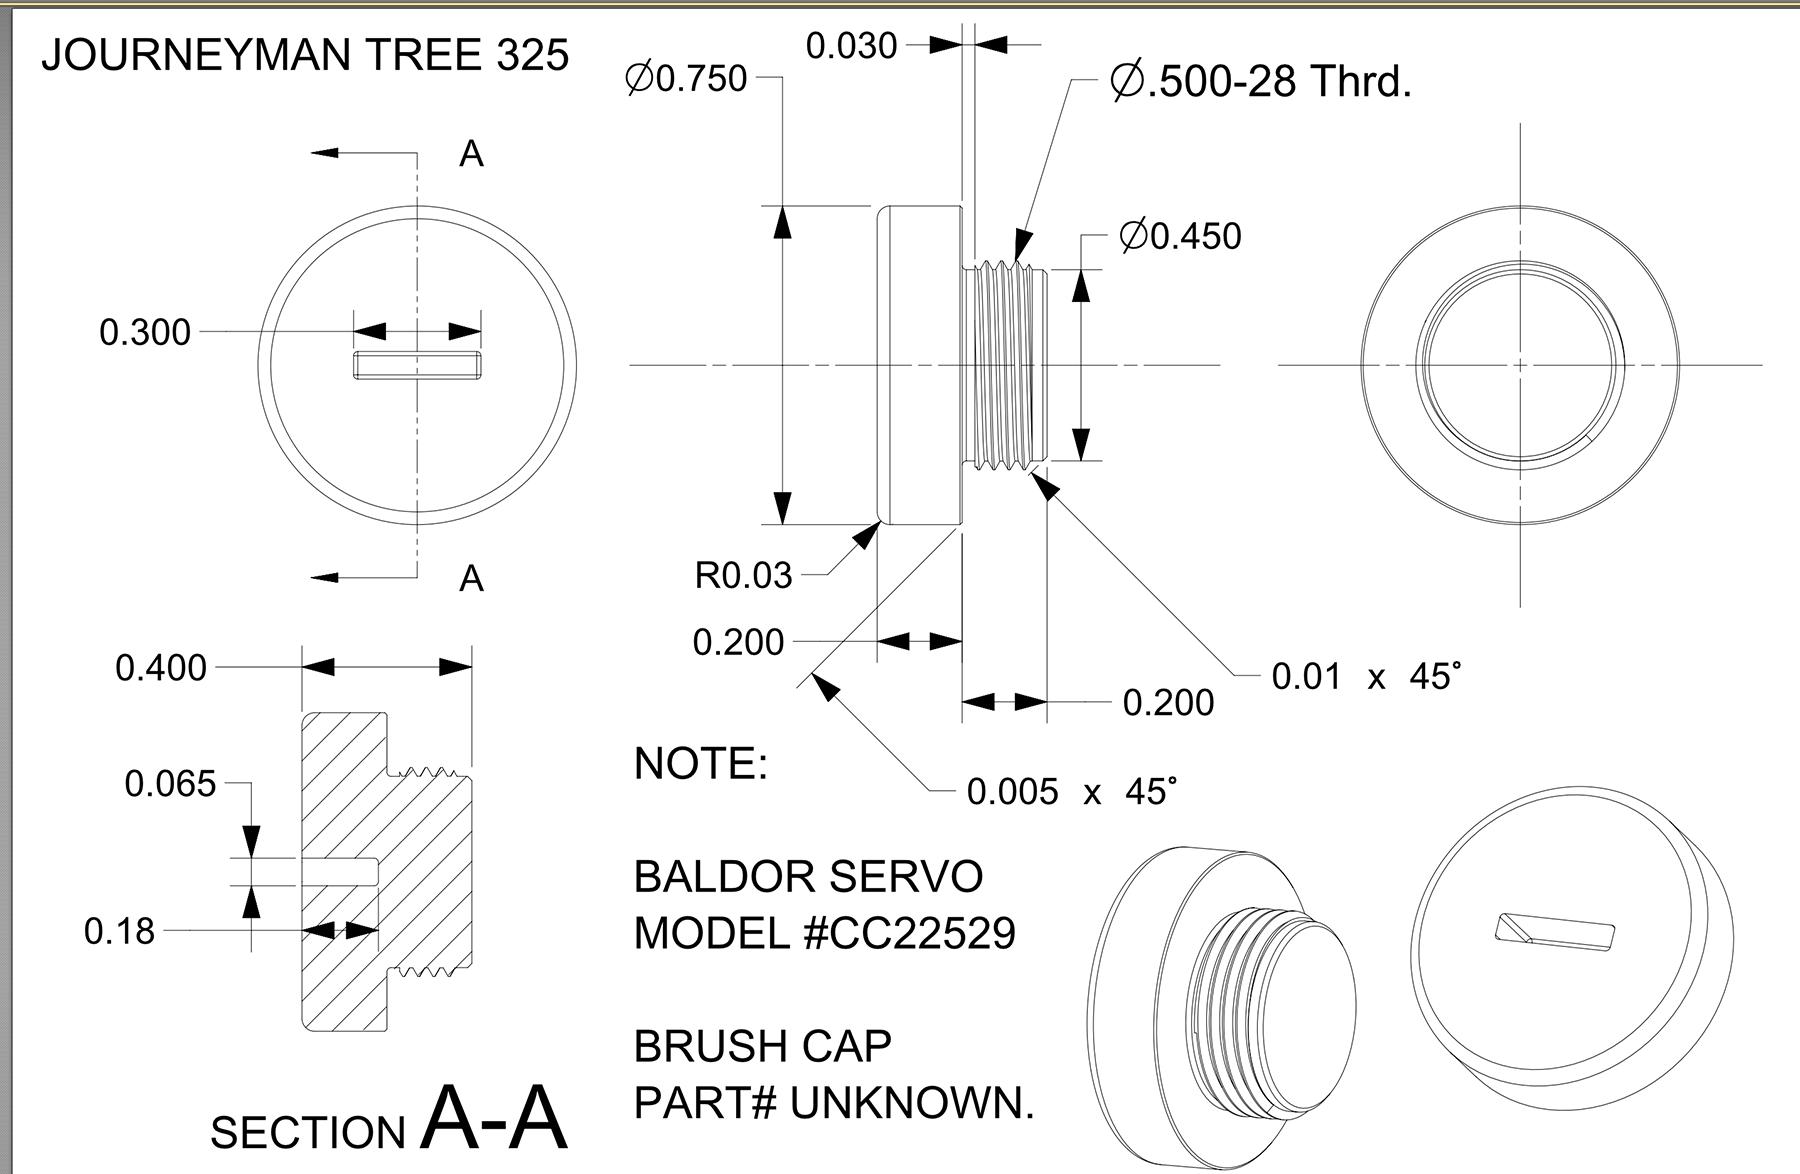 Baldor Servo Model #CC22529 (Brushes and Cap) on dc motor wiring schematic, dc shunt motor wiring diagram, dc motor drawings, brushless dc motor wiring diagram, ac brush motor schematic diagram, servo motor block diagram, brushed dc motor diagram,